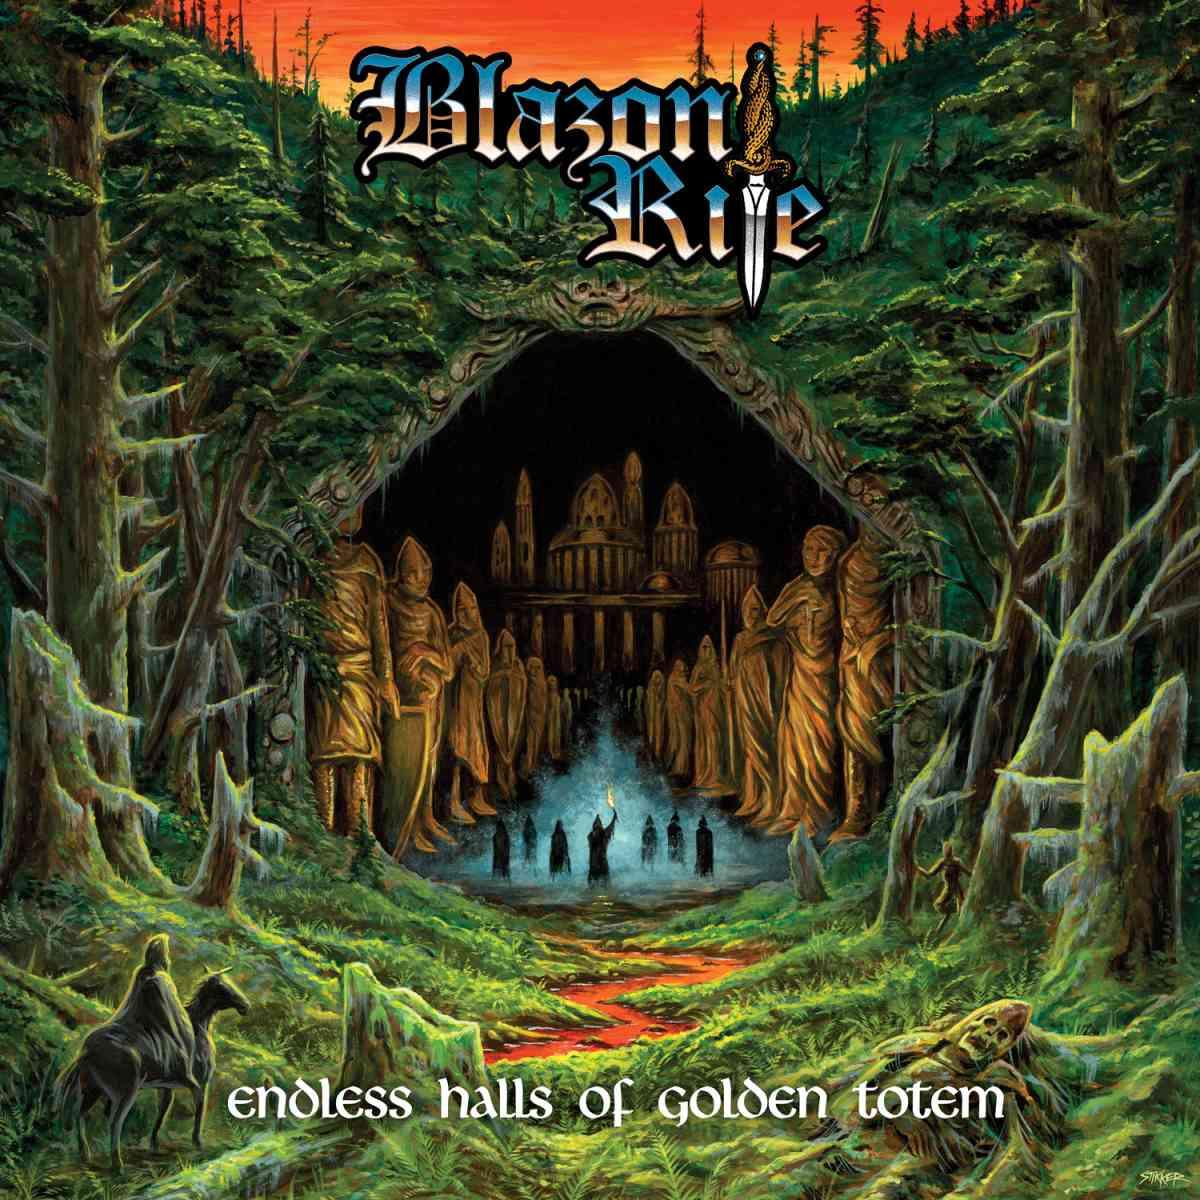 Blazon Rite - Endless Halls Of Golden Totem - album cover